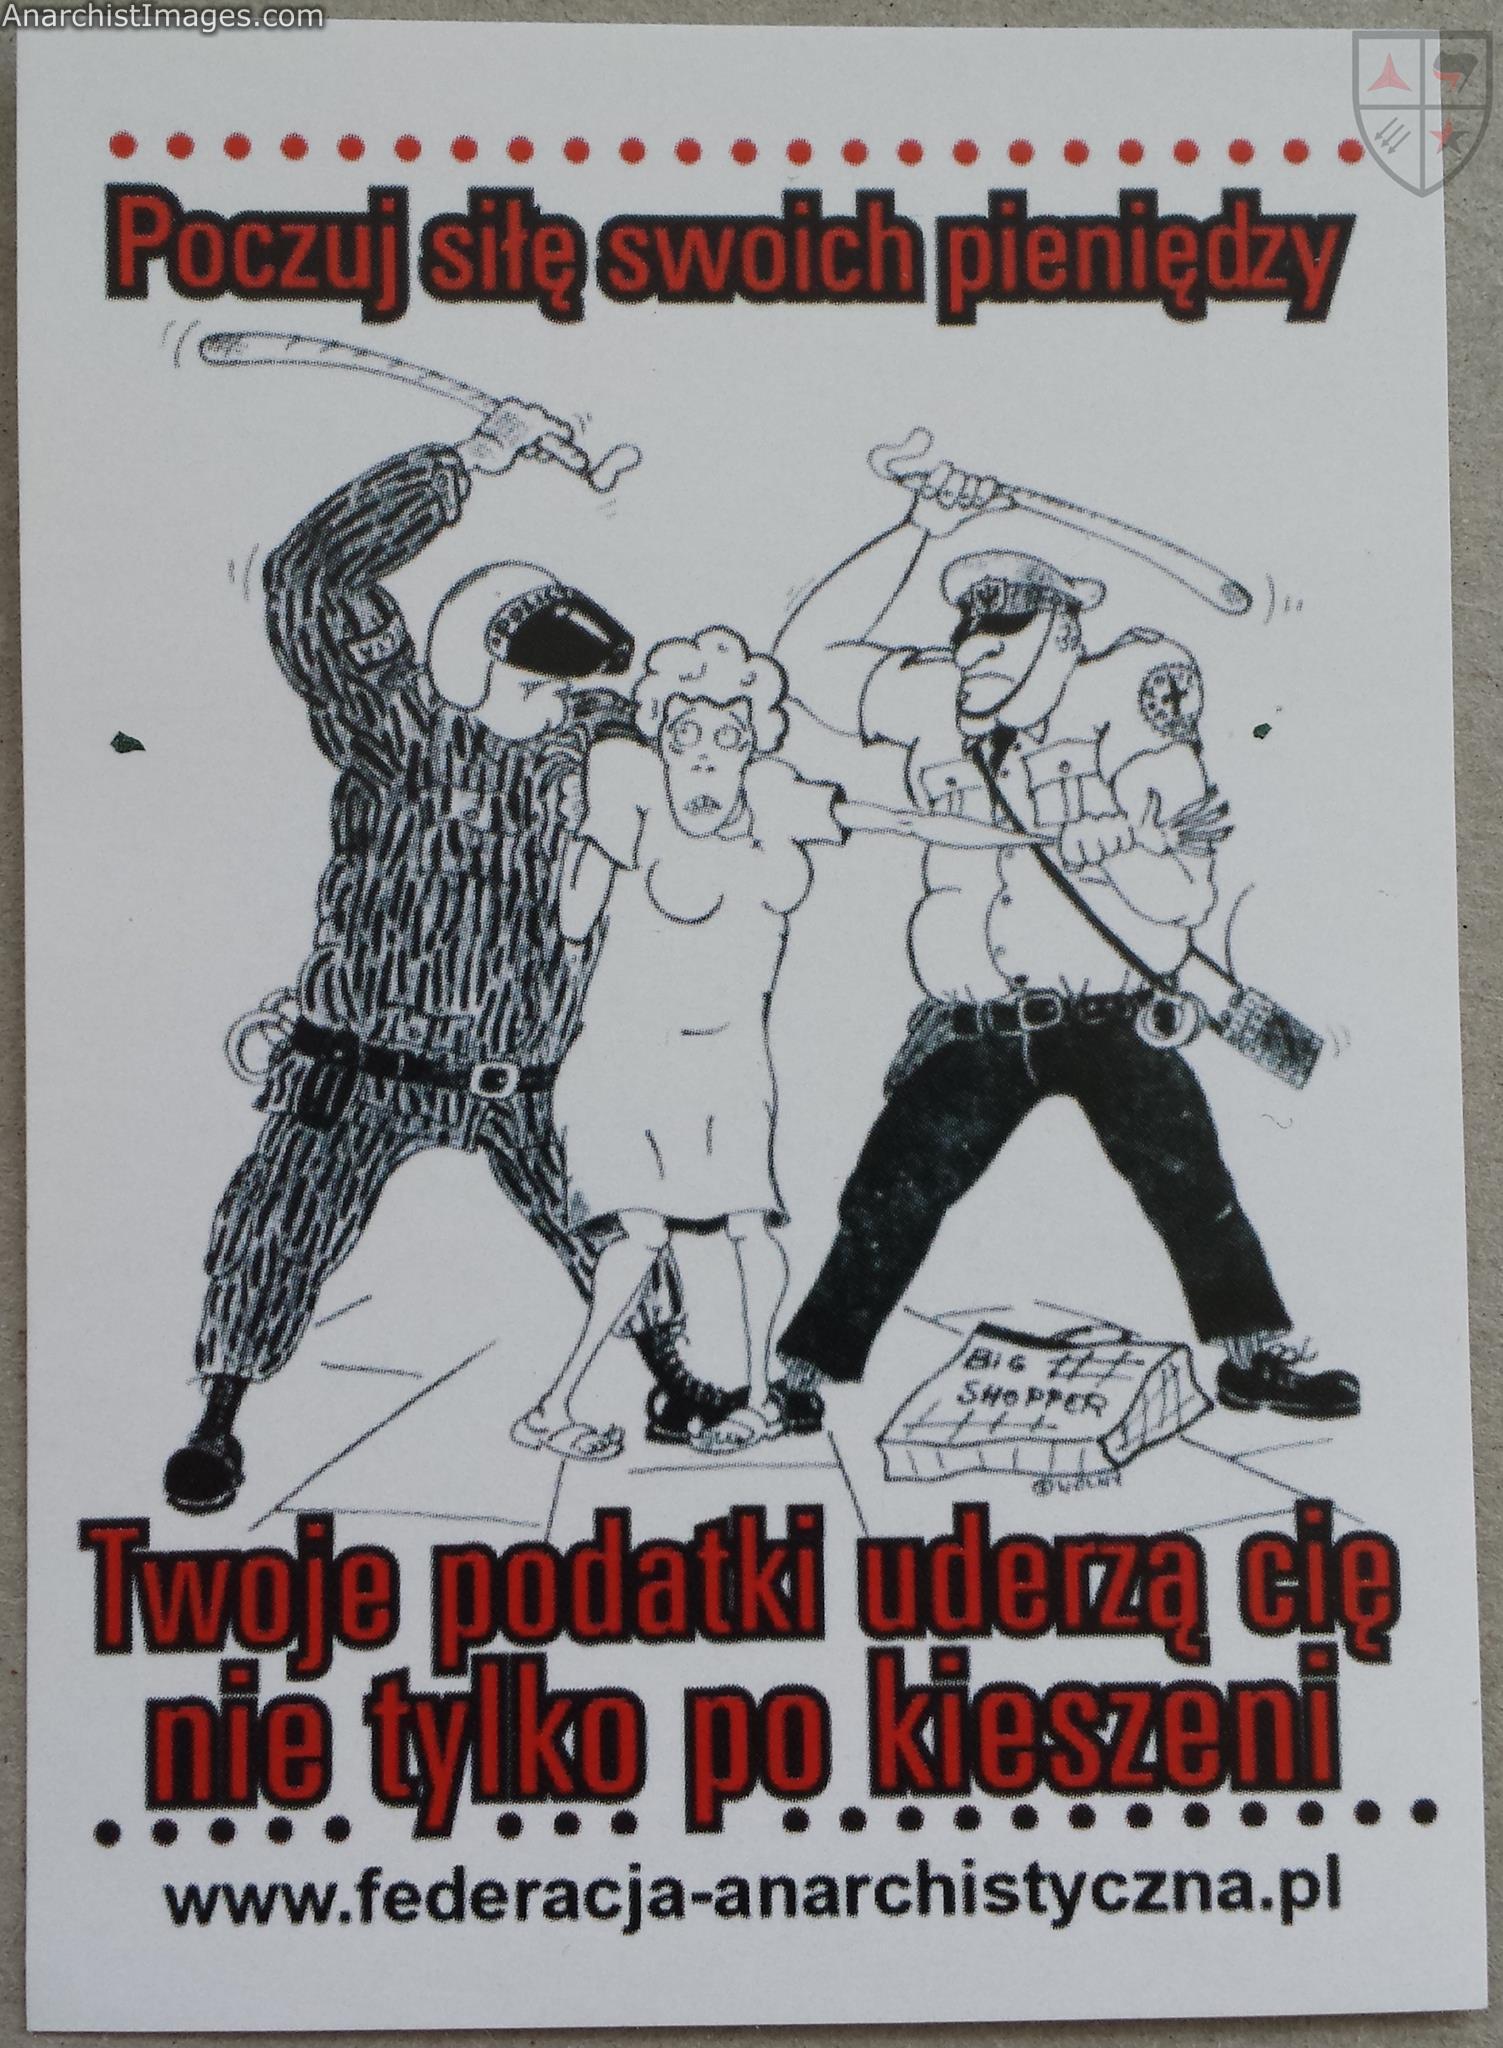 socialist equality meme